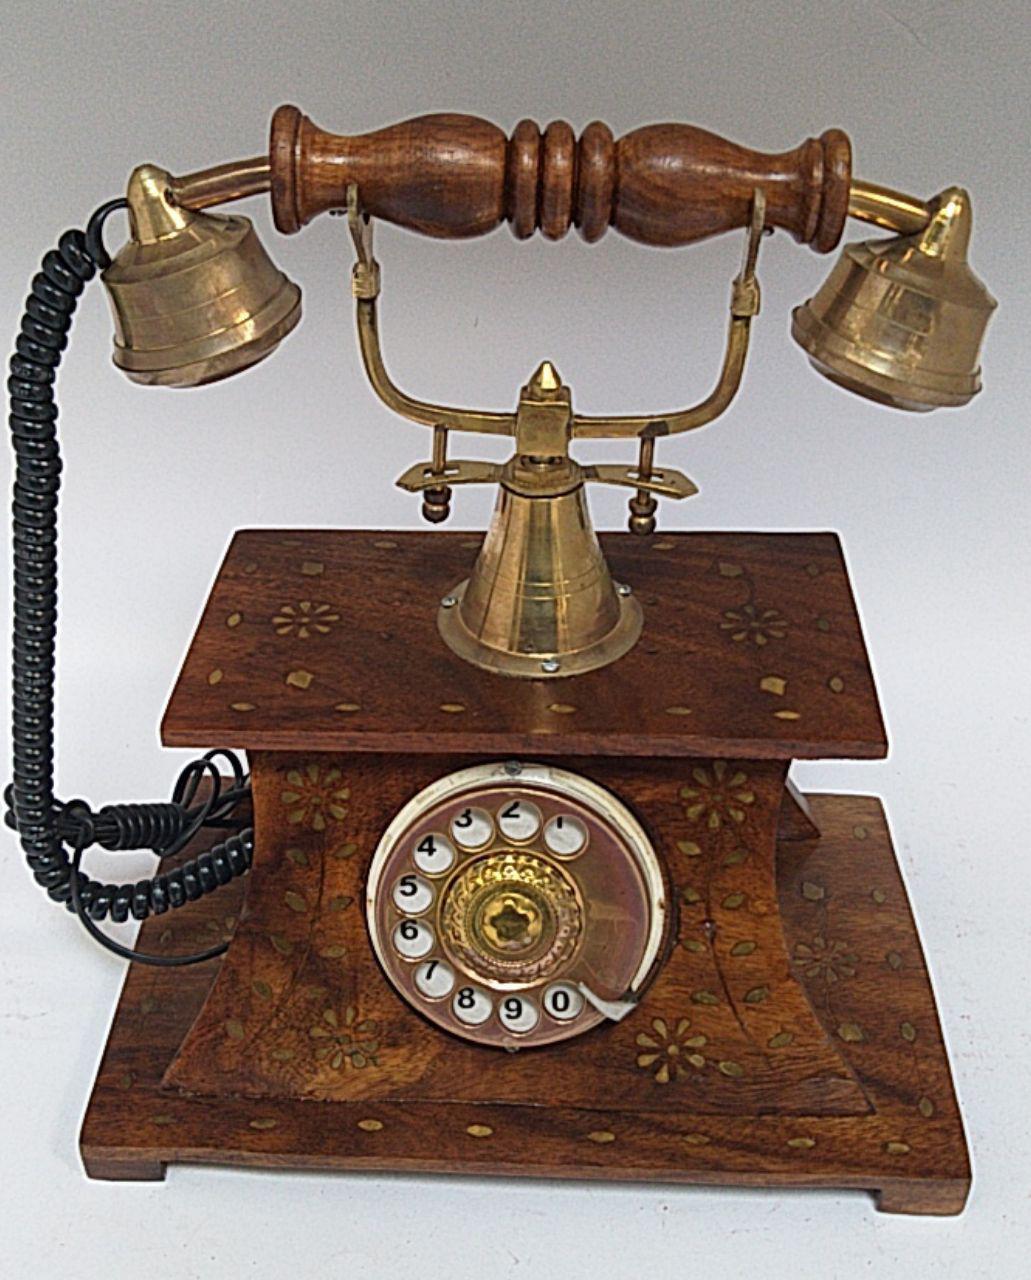 73b718e32877f تليفون ديكور قرص خشبي هاند ميد براس نحاس